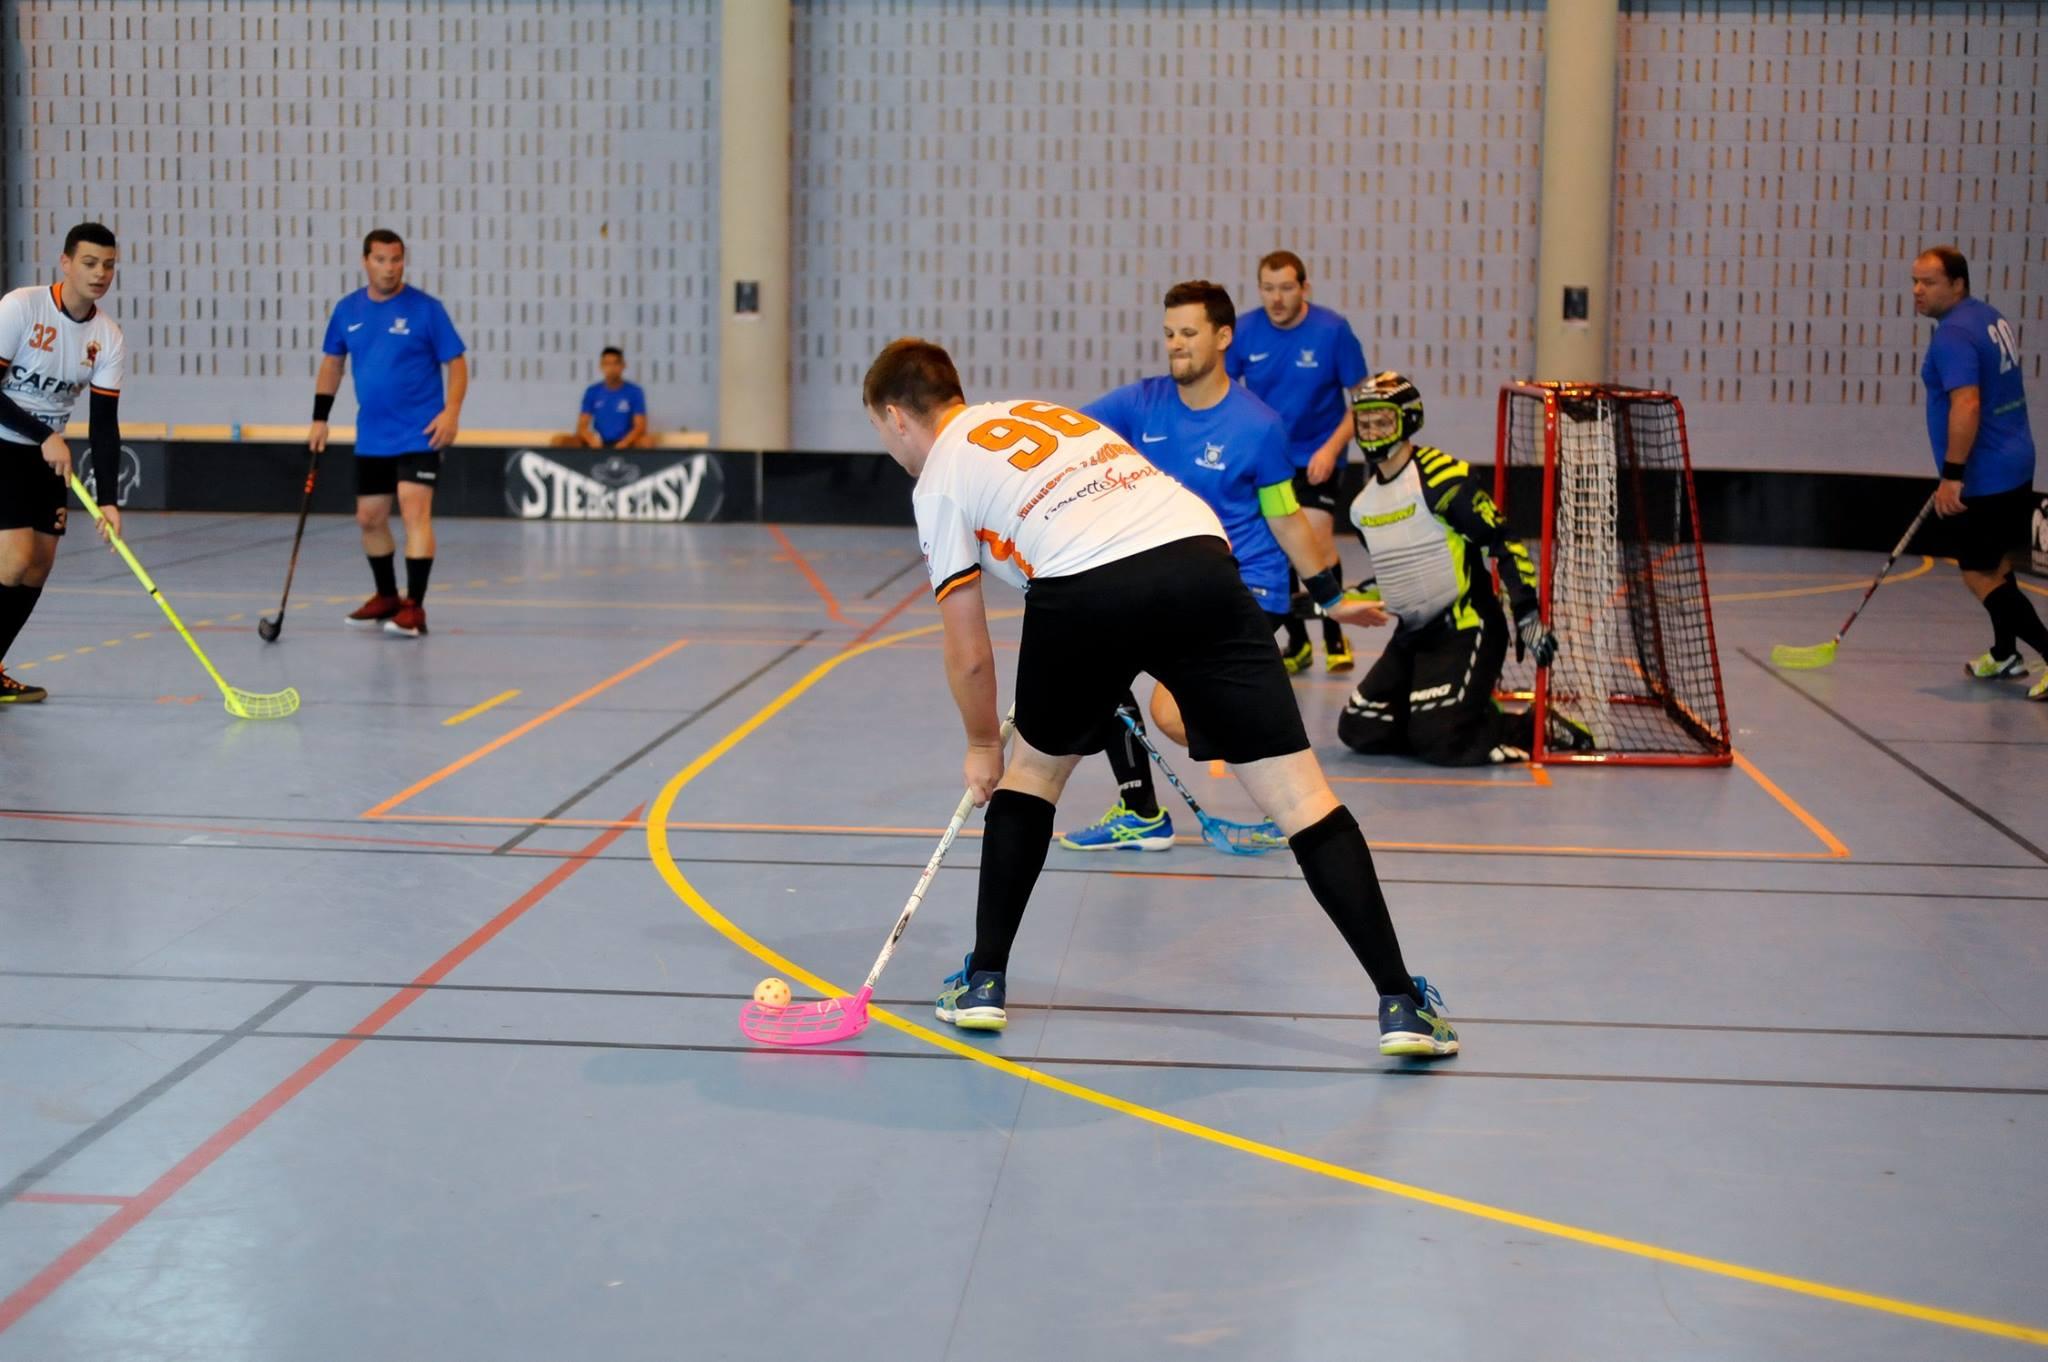 Amiens Floorball N1 vs Rouen Floorball